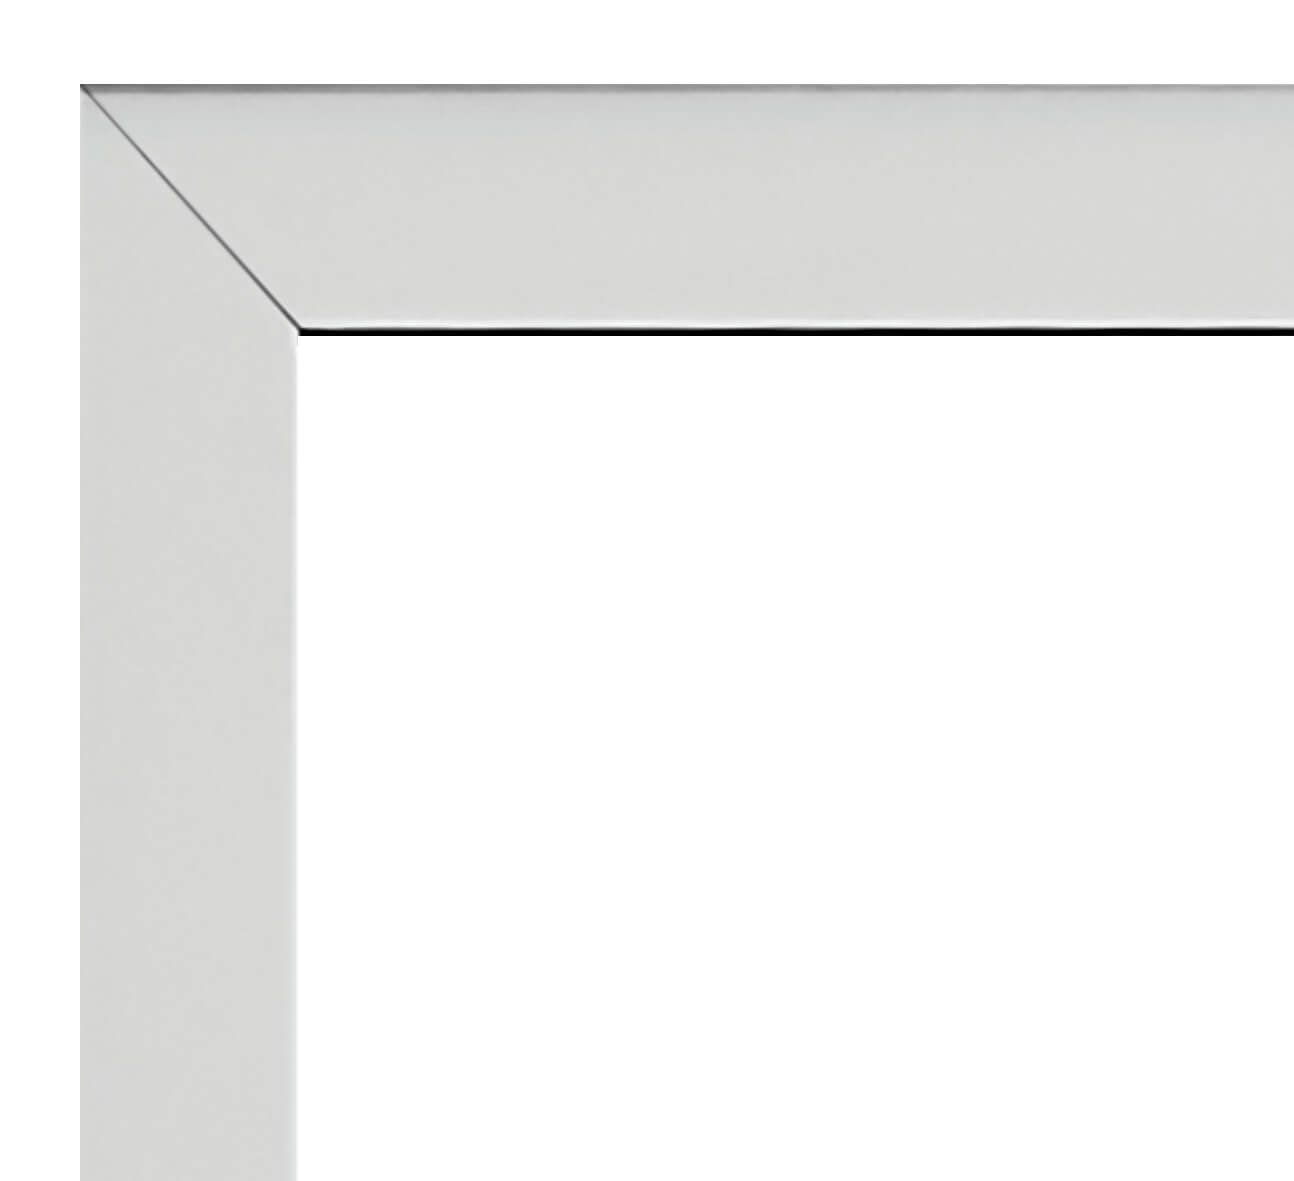 Aluminium Guarnição - 1.00x2.00 Ref. 74.92.618-5 Sasazaki